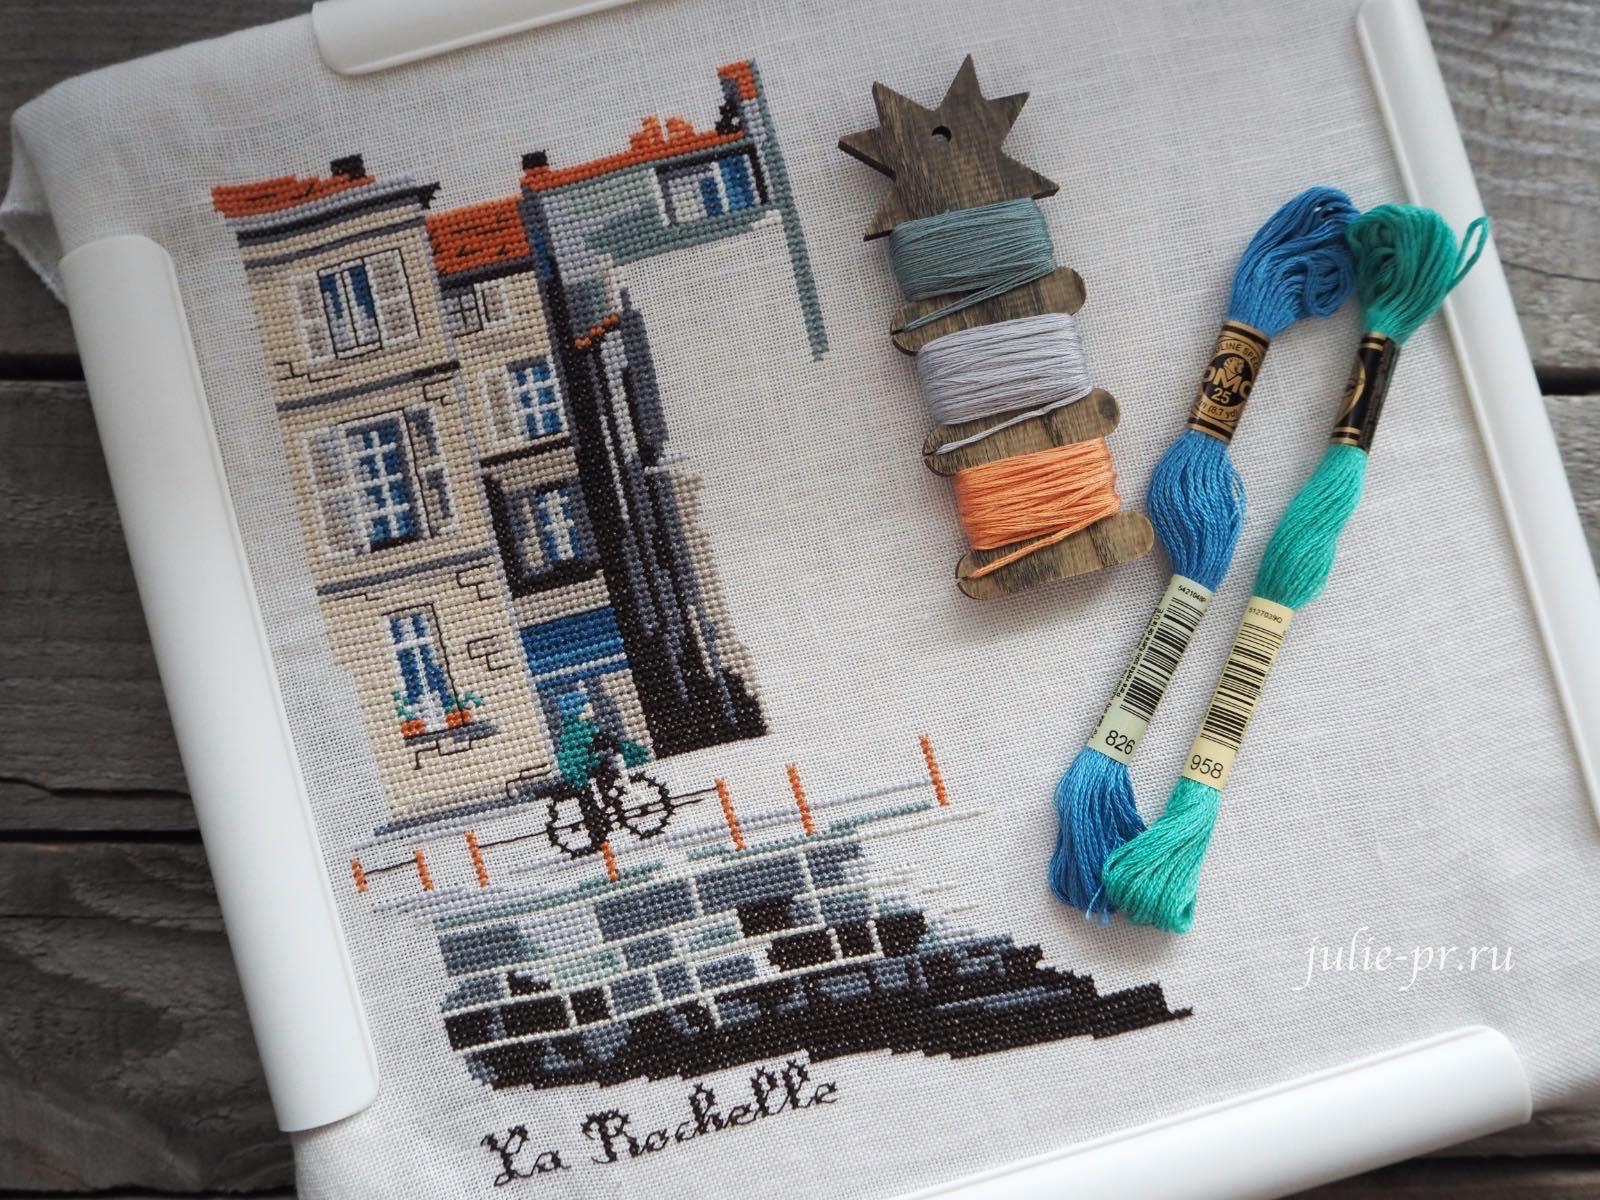 вышивка крестом, Isabelle Vautier, La Rochelle, Изабель Вотье, Ла Рошель